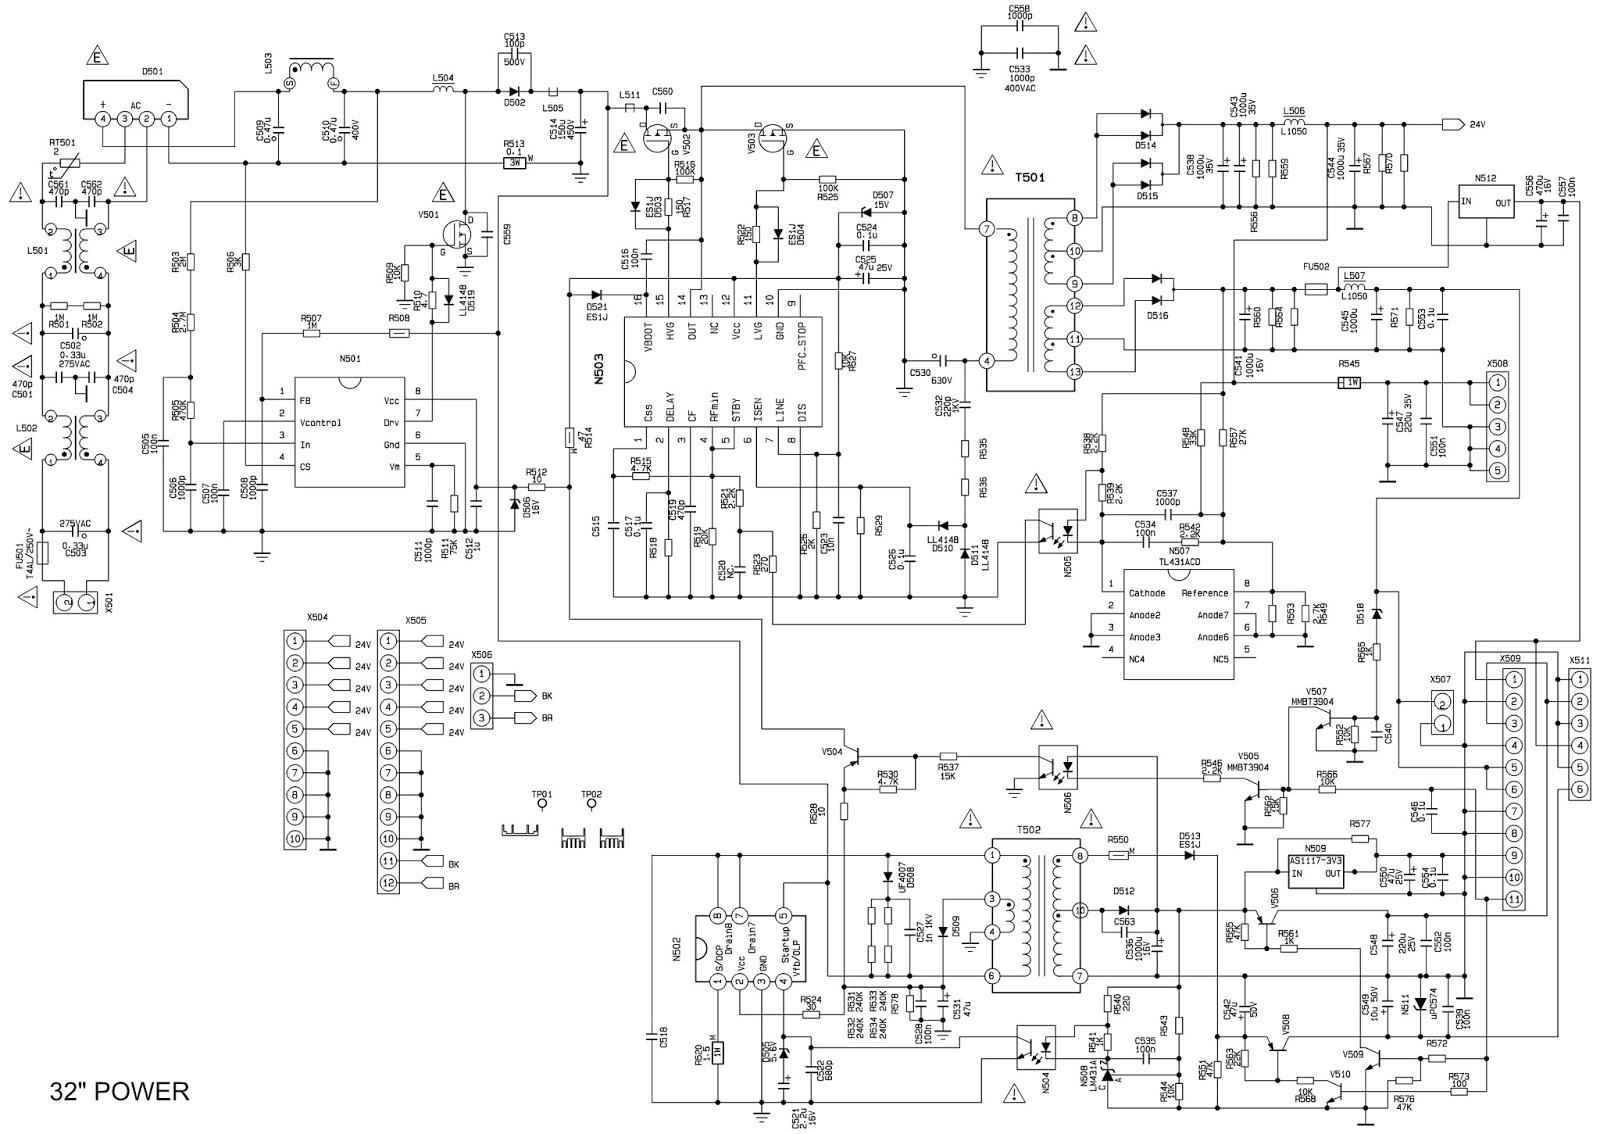 bbk lt 3210 lcd tv 32 power supply 26 power supply 26 t rh electronicshelponline blogspot com Travel Trailer Inverter Wiring Diagram Solar Inverter Wiring Diagram